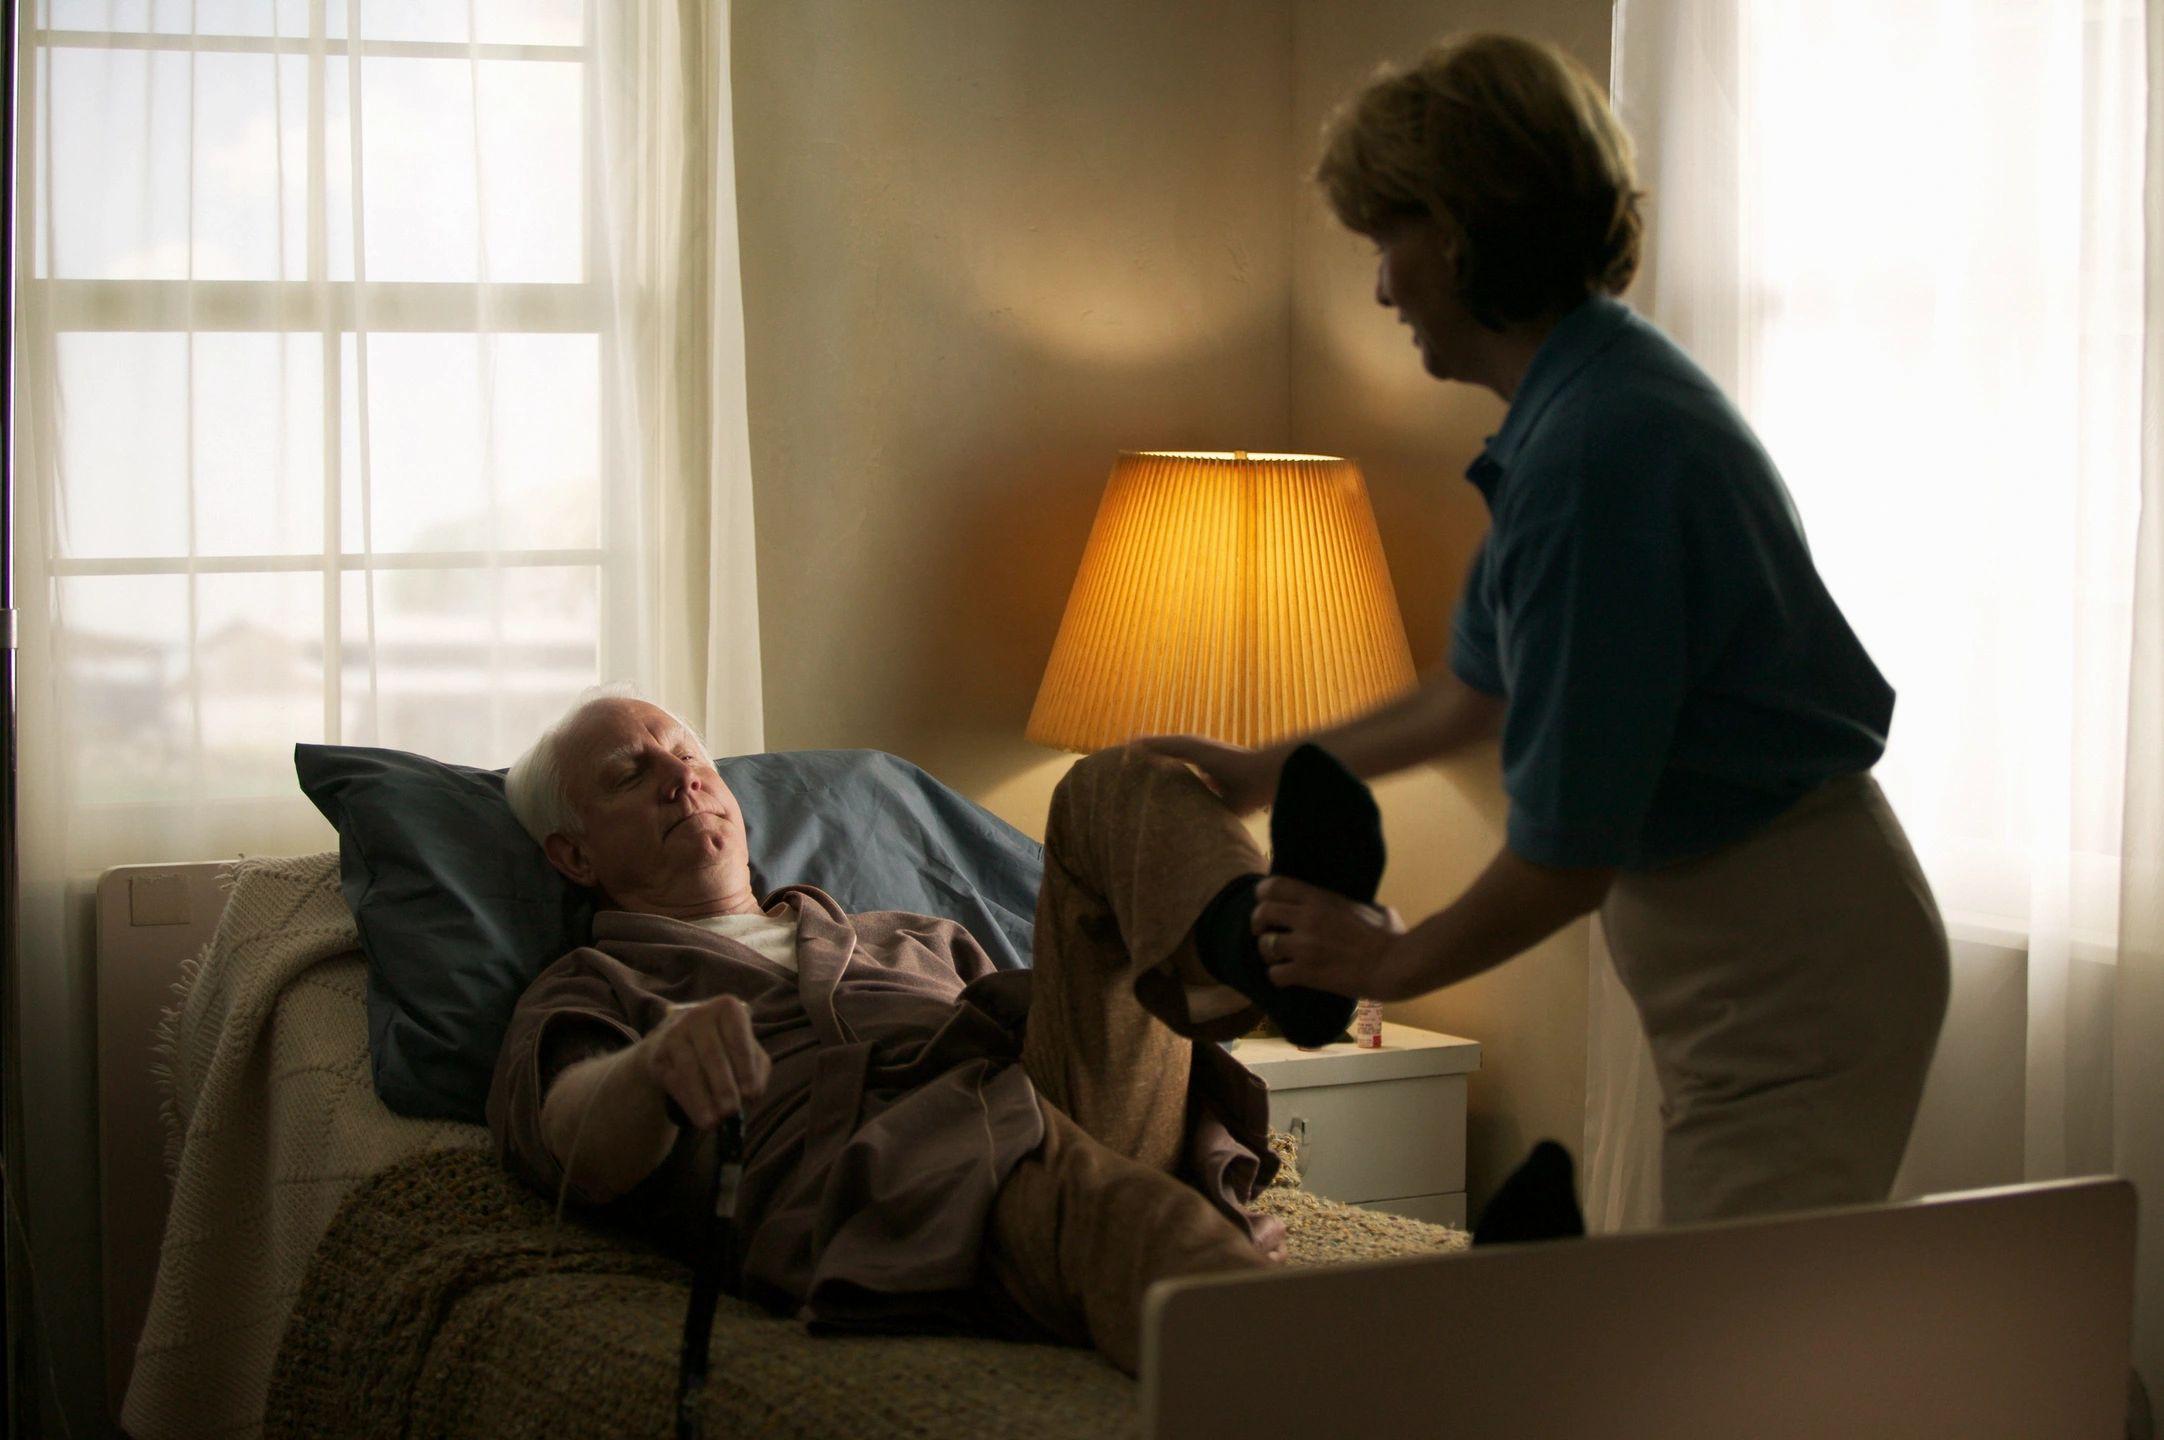 Senior Nails Services - Pedicure for Elderly, Pedicure